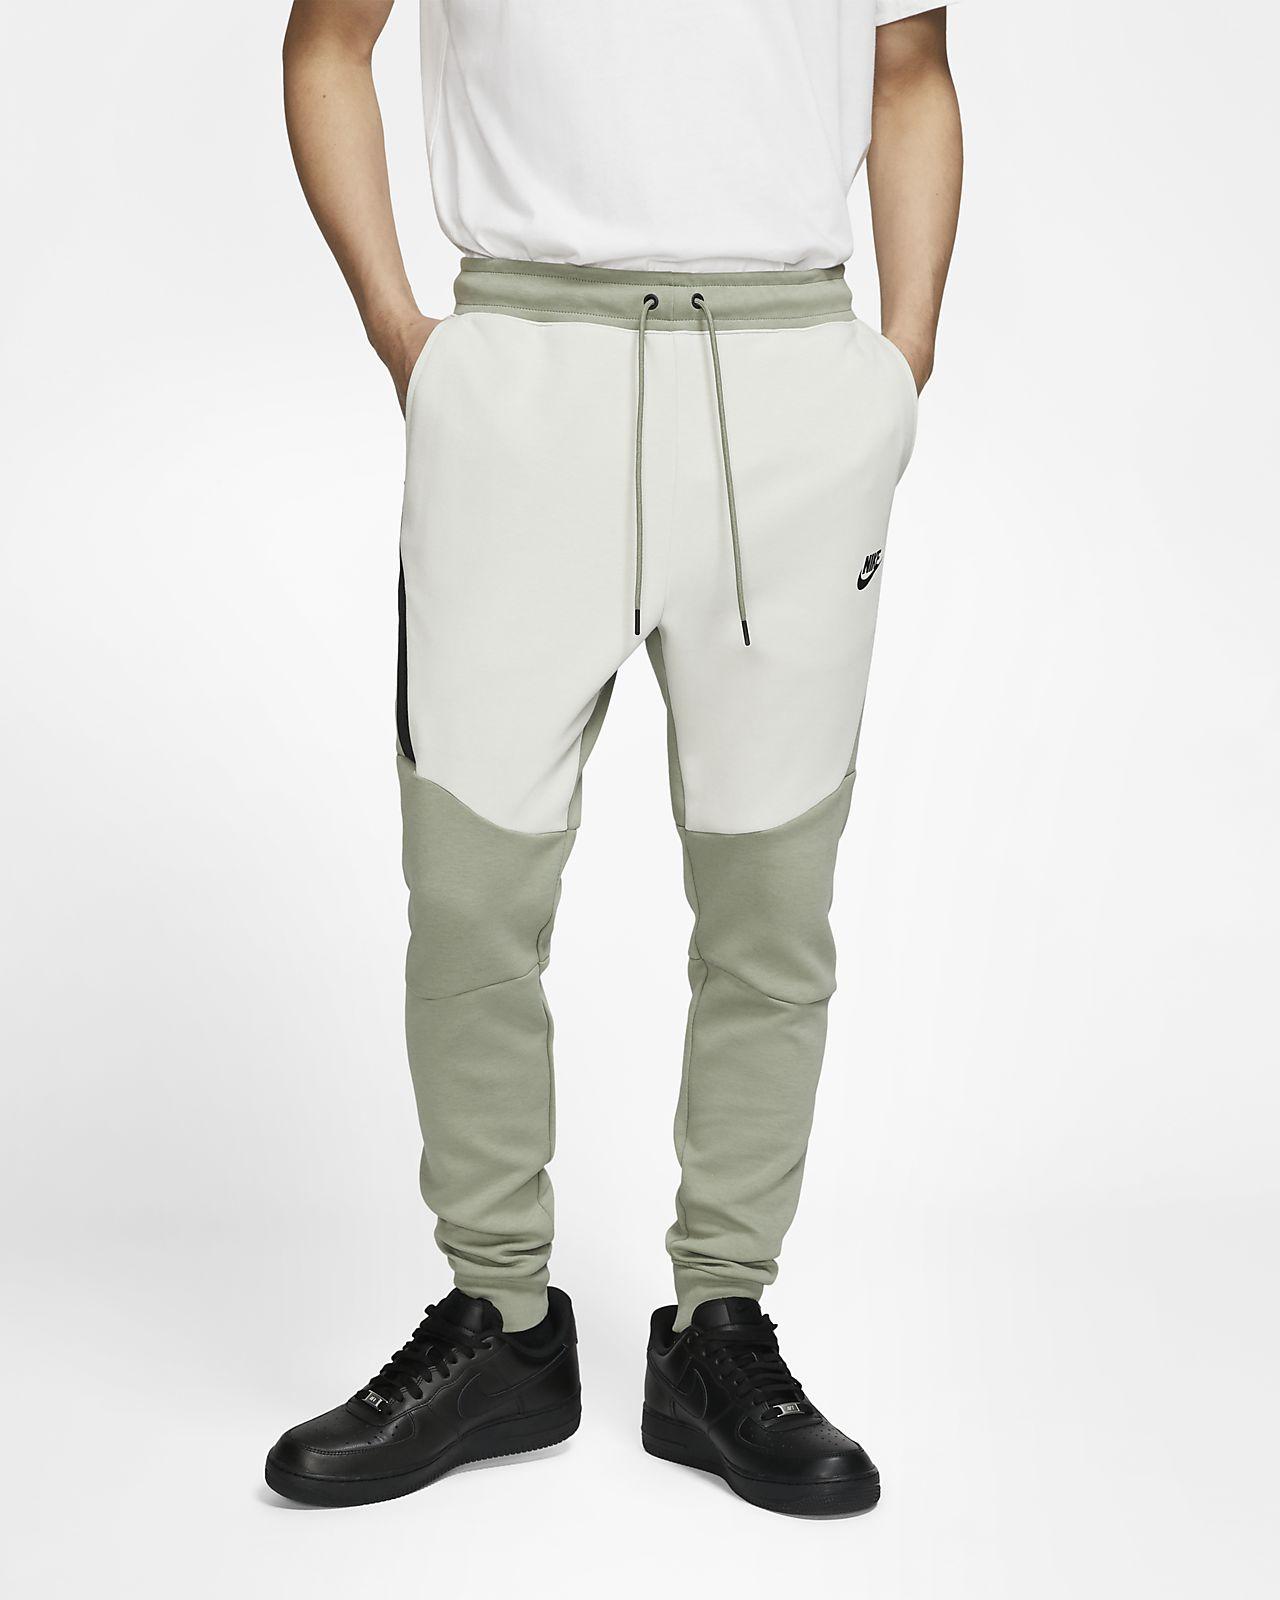 Pantalones deportivos para hombre Nike Sportswear Tech Fleece